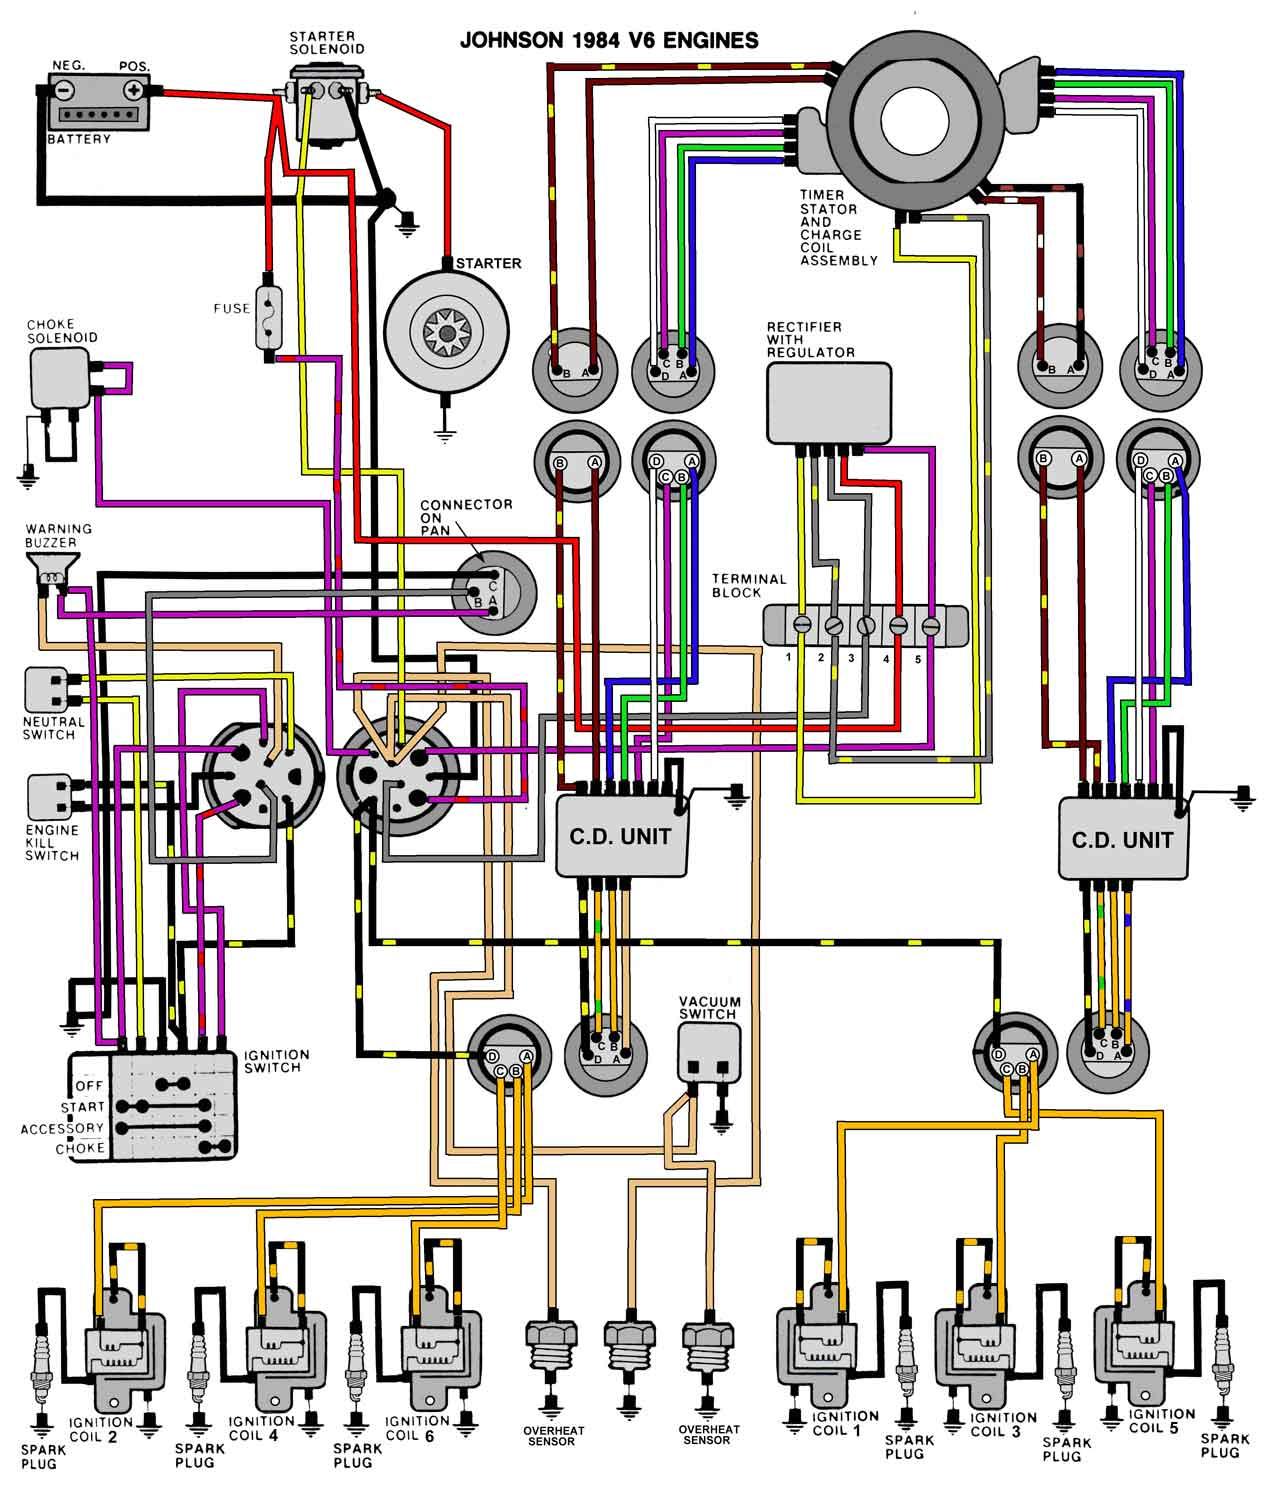 Evinrude Ignition Wiring Diagram